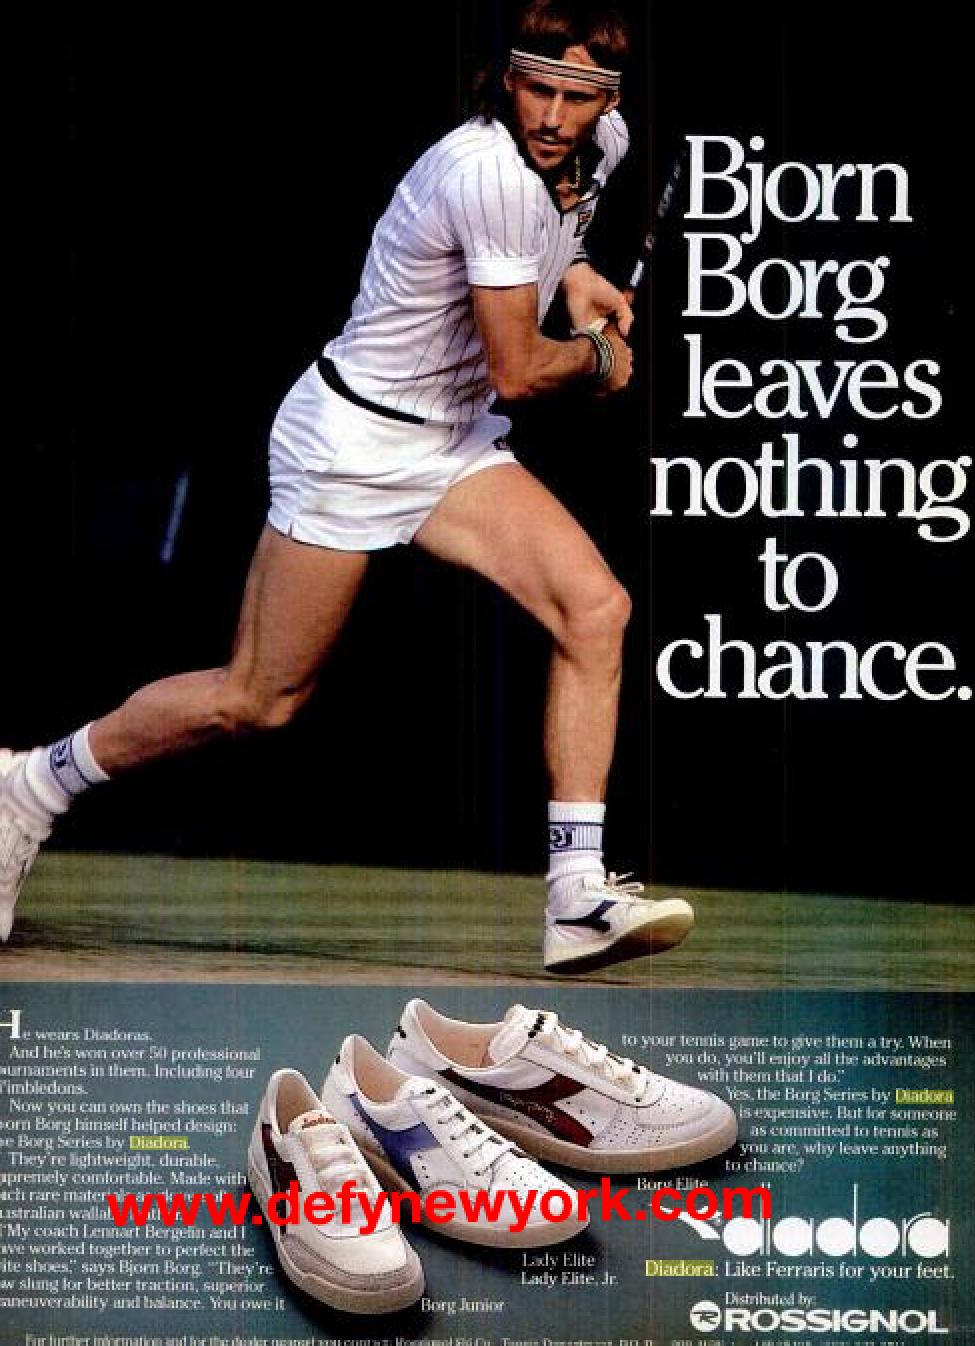 Diadora. | Tennis funny, Tennis, Bjorn borg